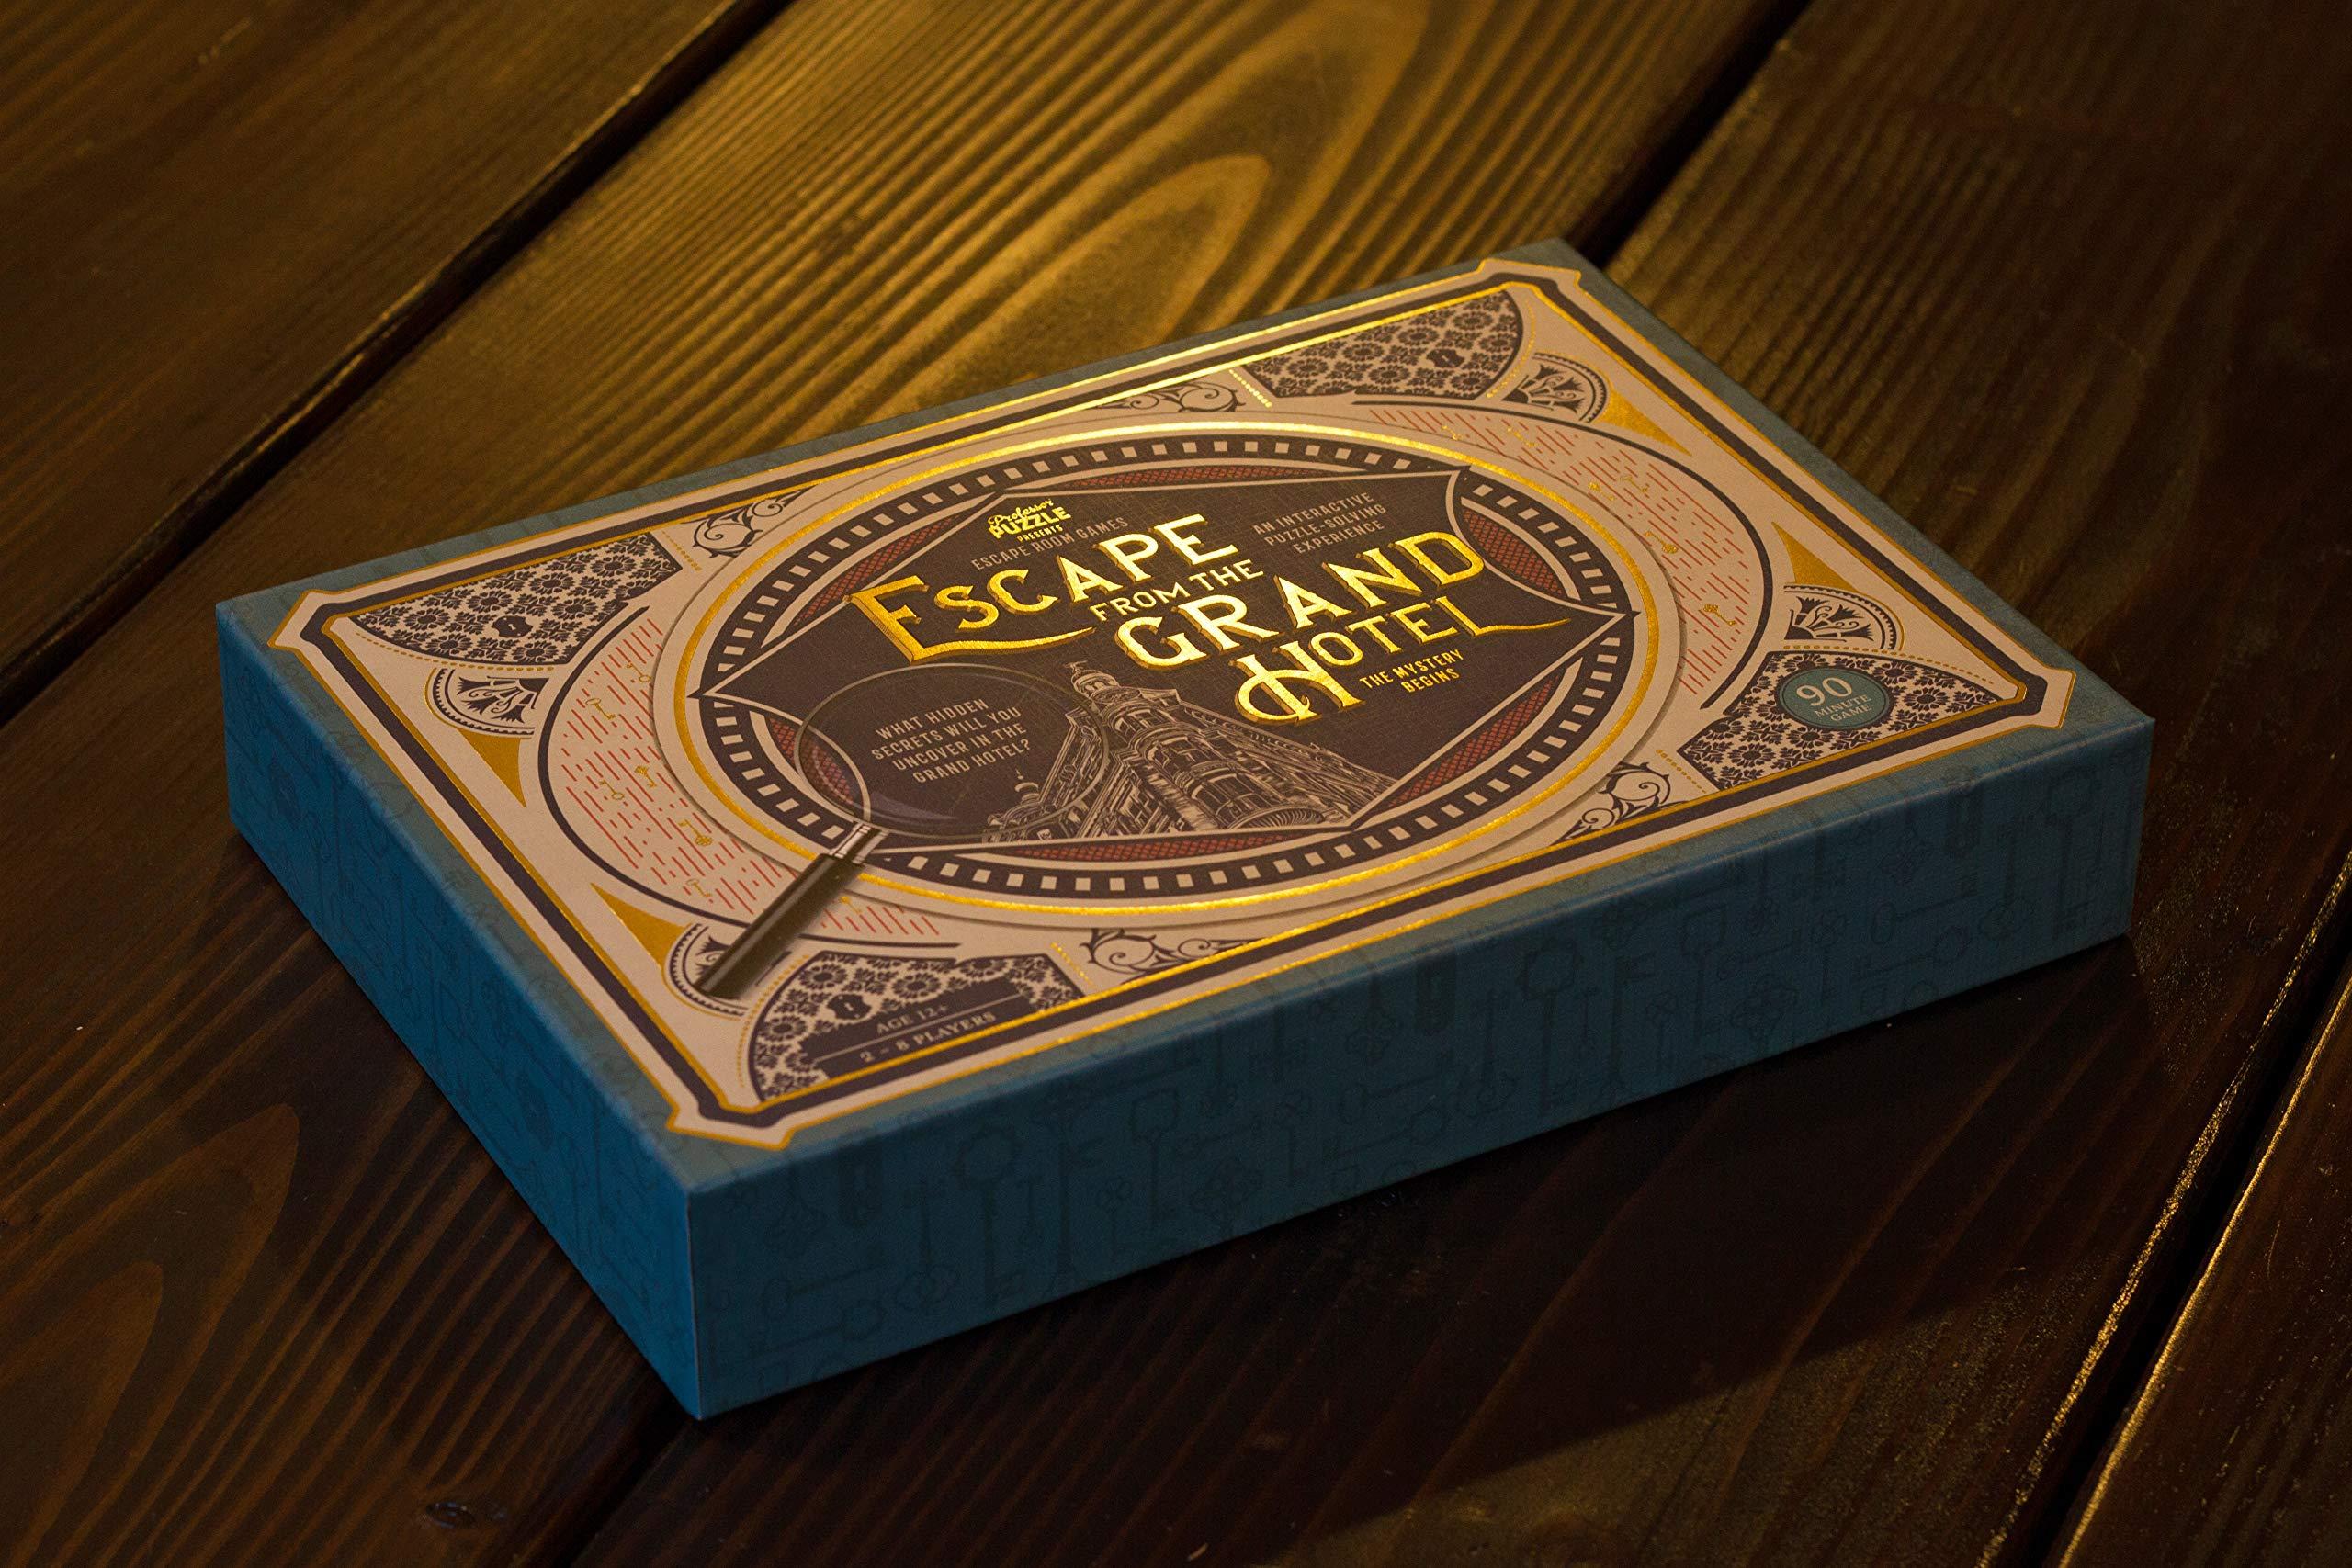 Escape from the Grand Hotel Game: Amazon.es: Libros en idiomas extranjeros